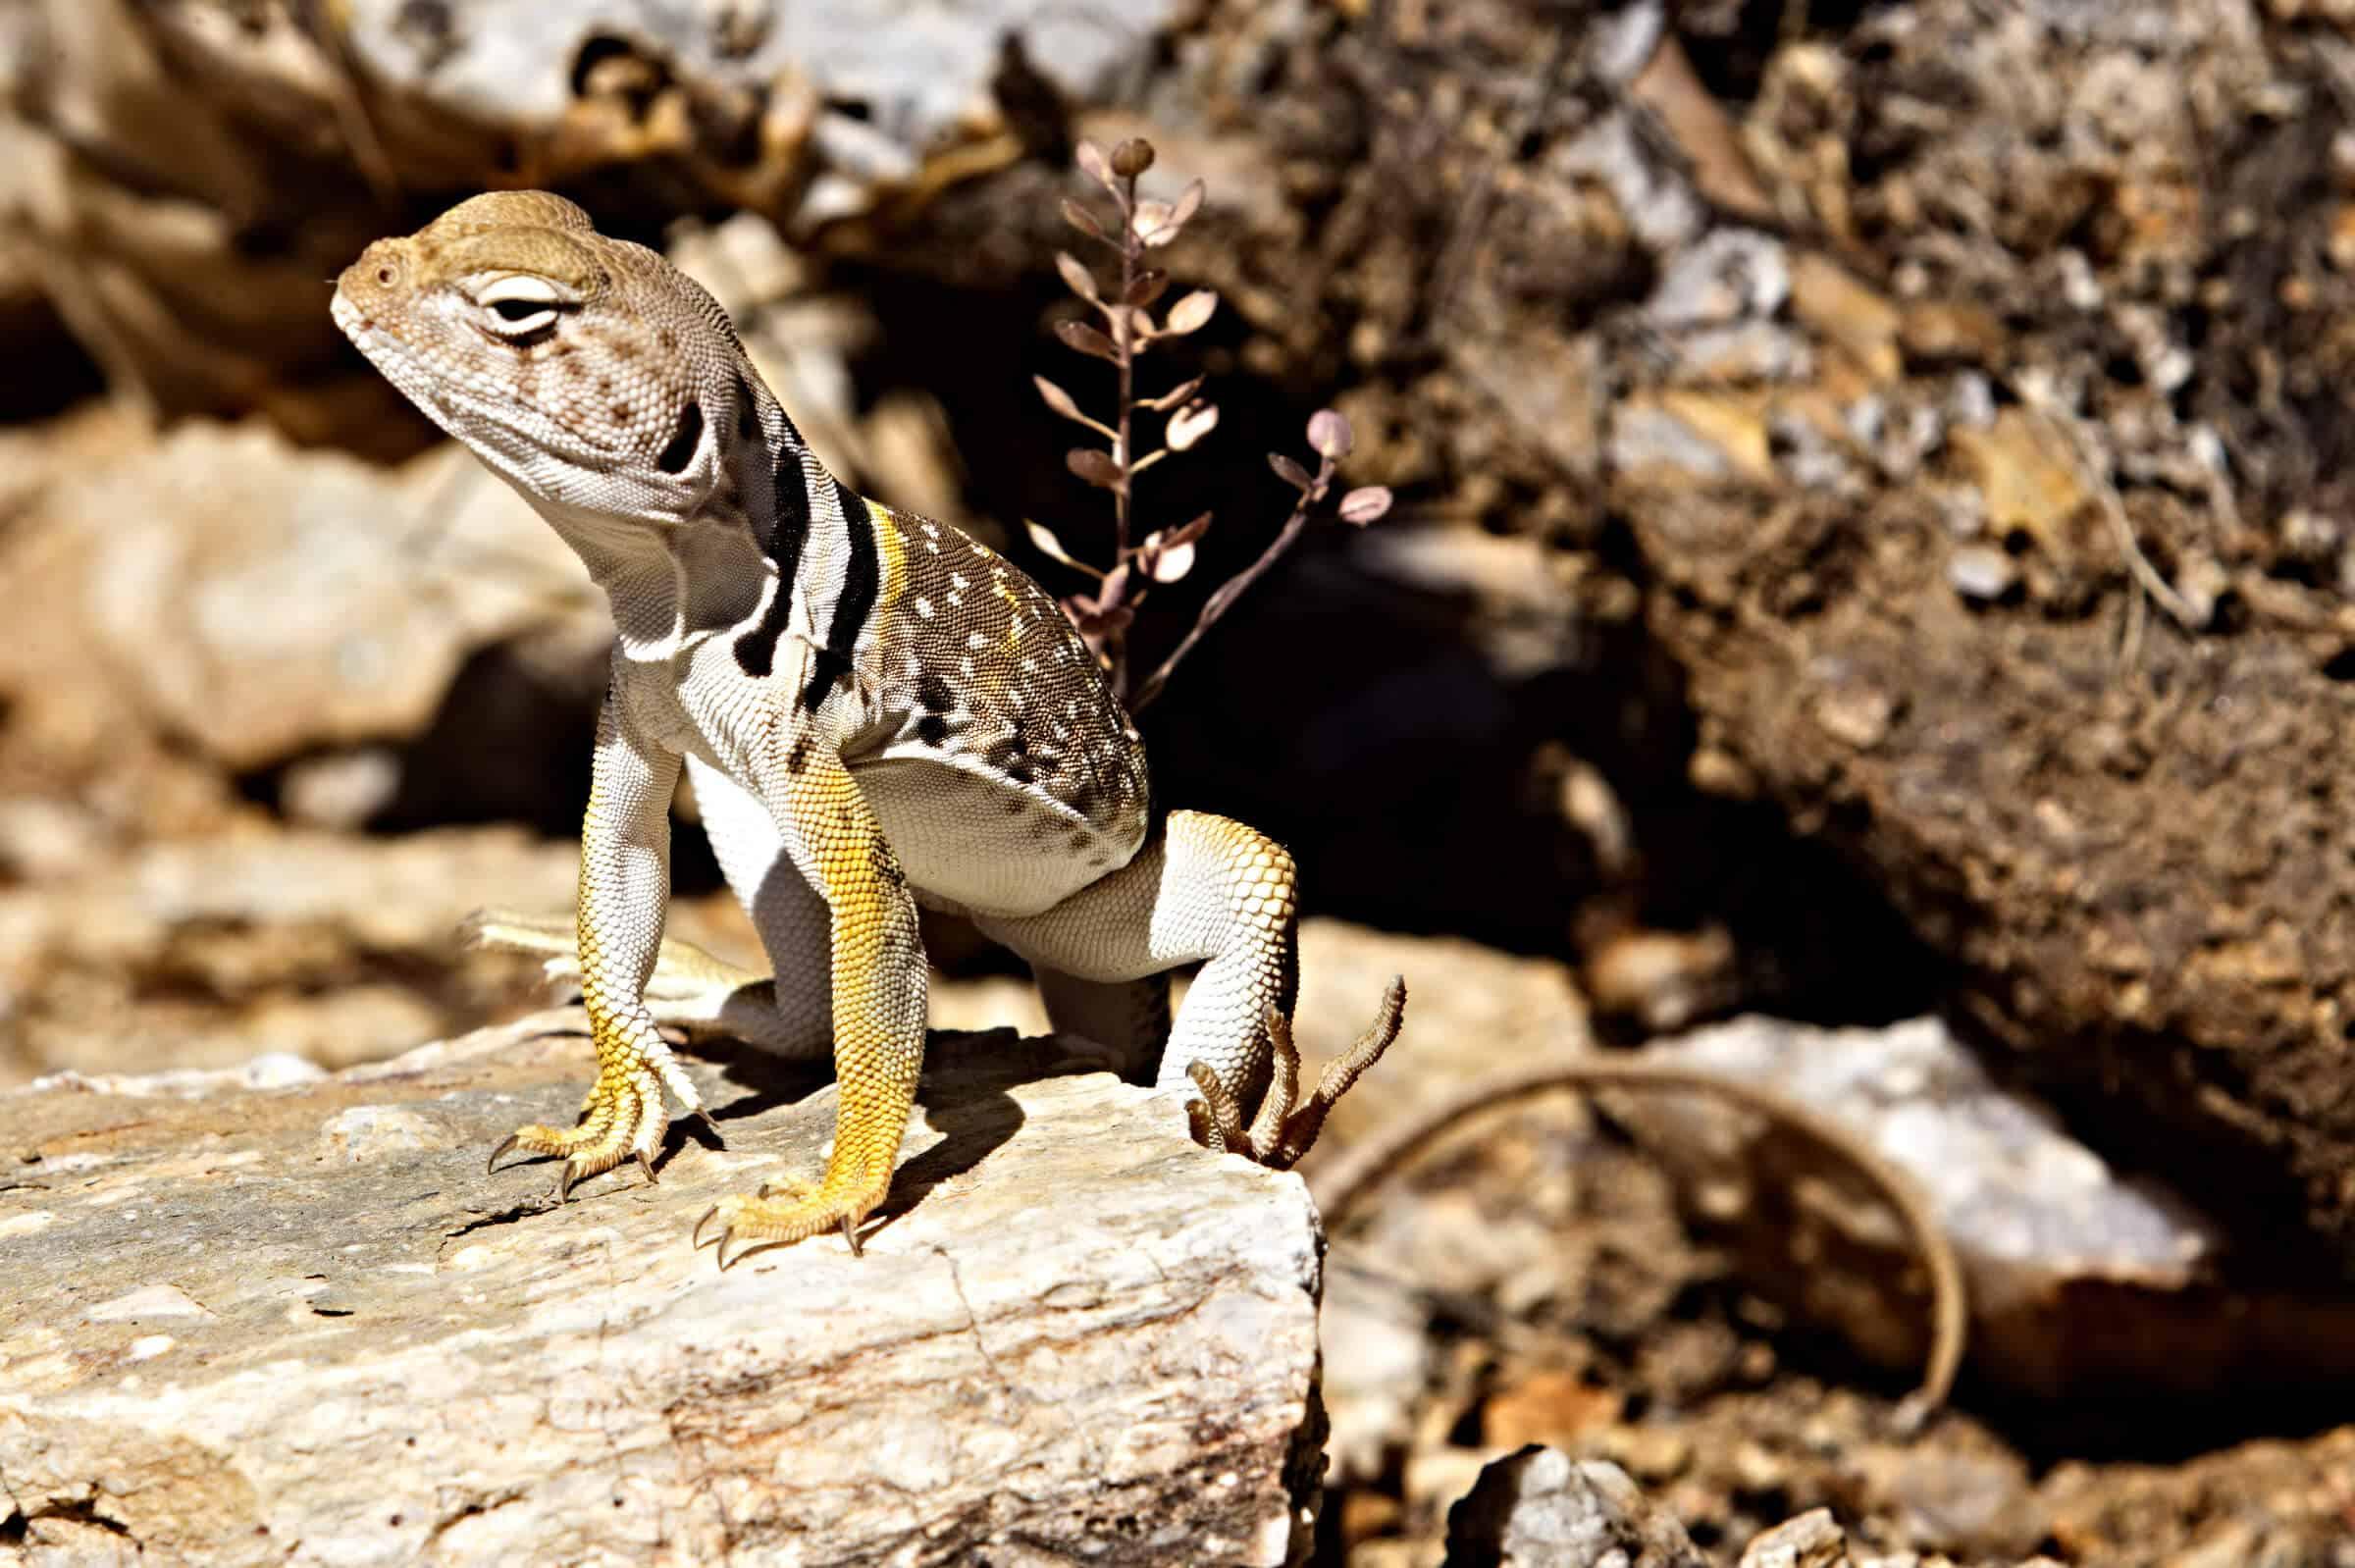 Ned Harris photo of Eastern Collared Lizard